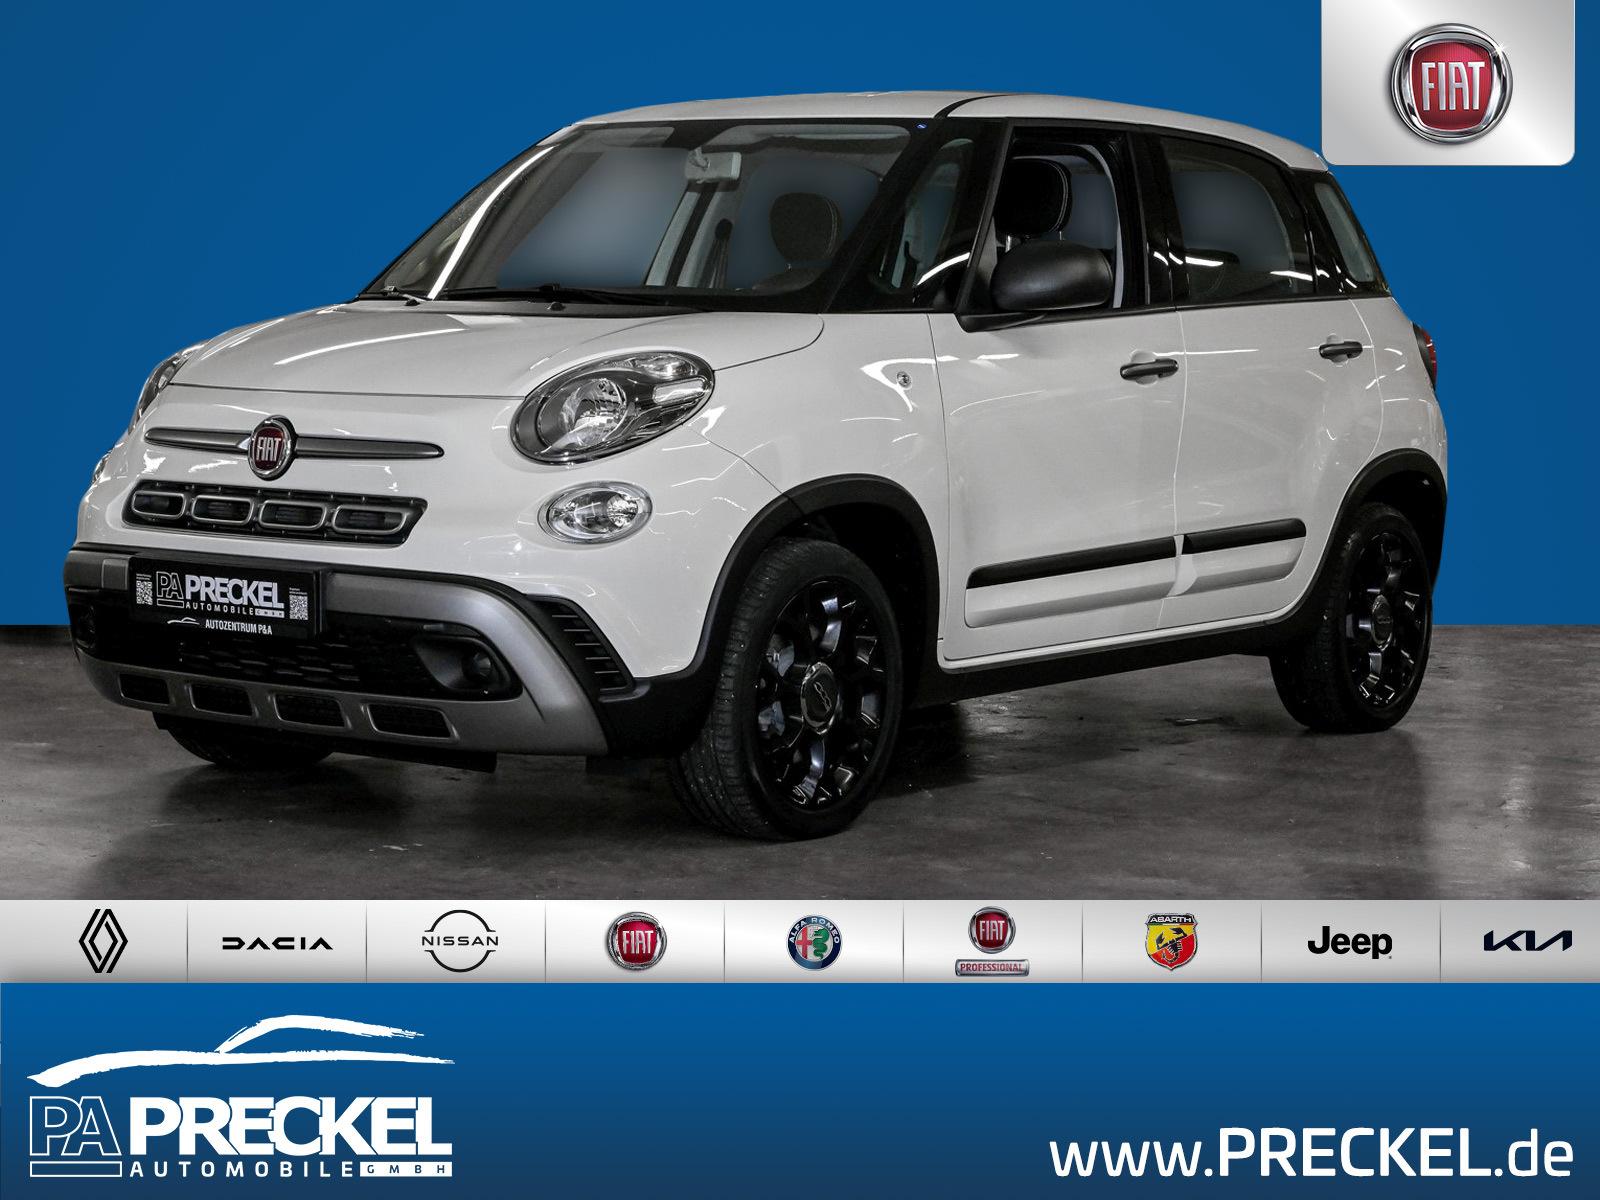 Fiat 500L T-Jet City Cross 1.4 16V /Klima /LM-Felgen, Jahr 2017, Benzin